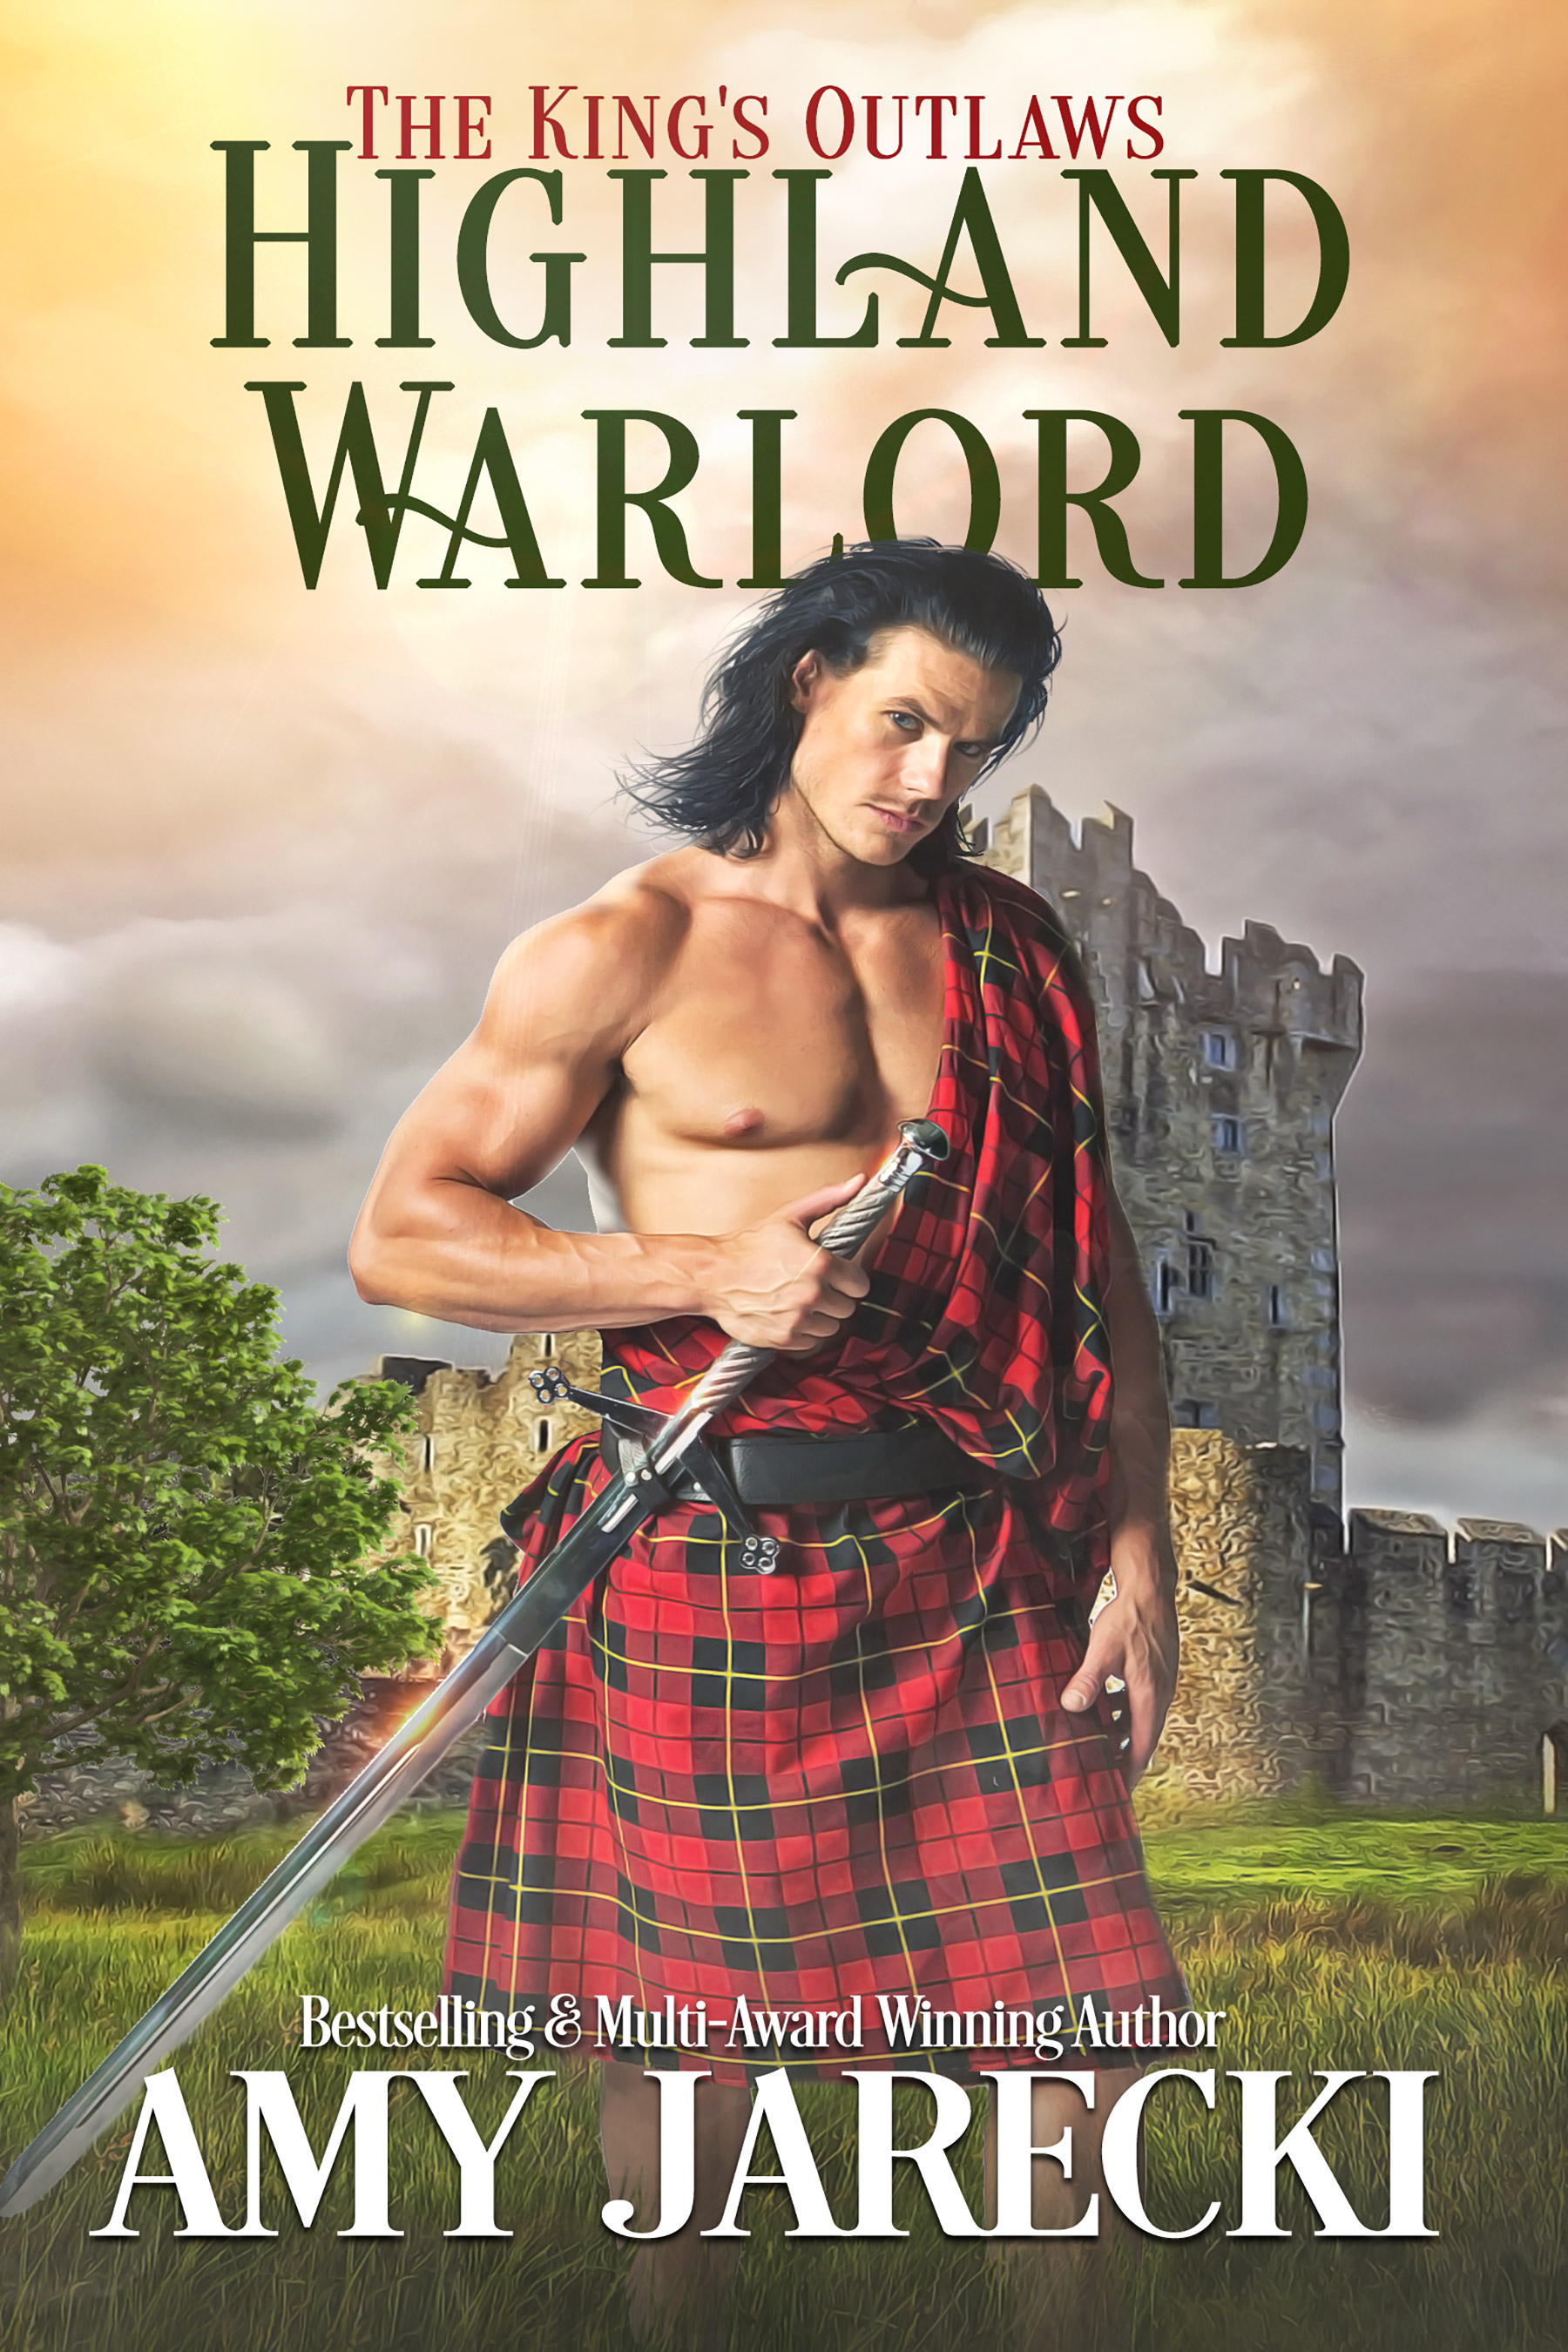 Highland-Warlord-web (1)